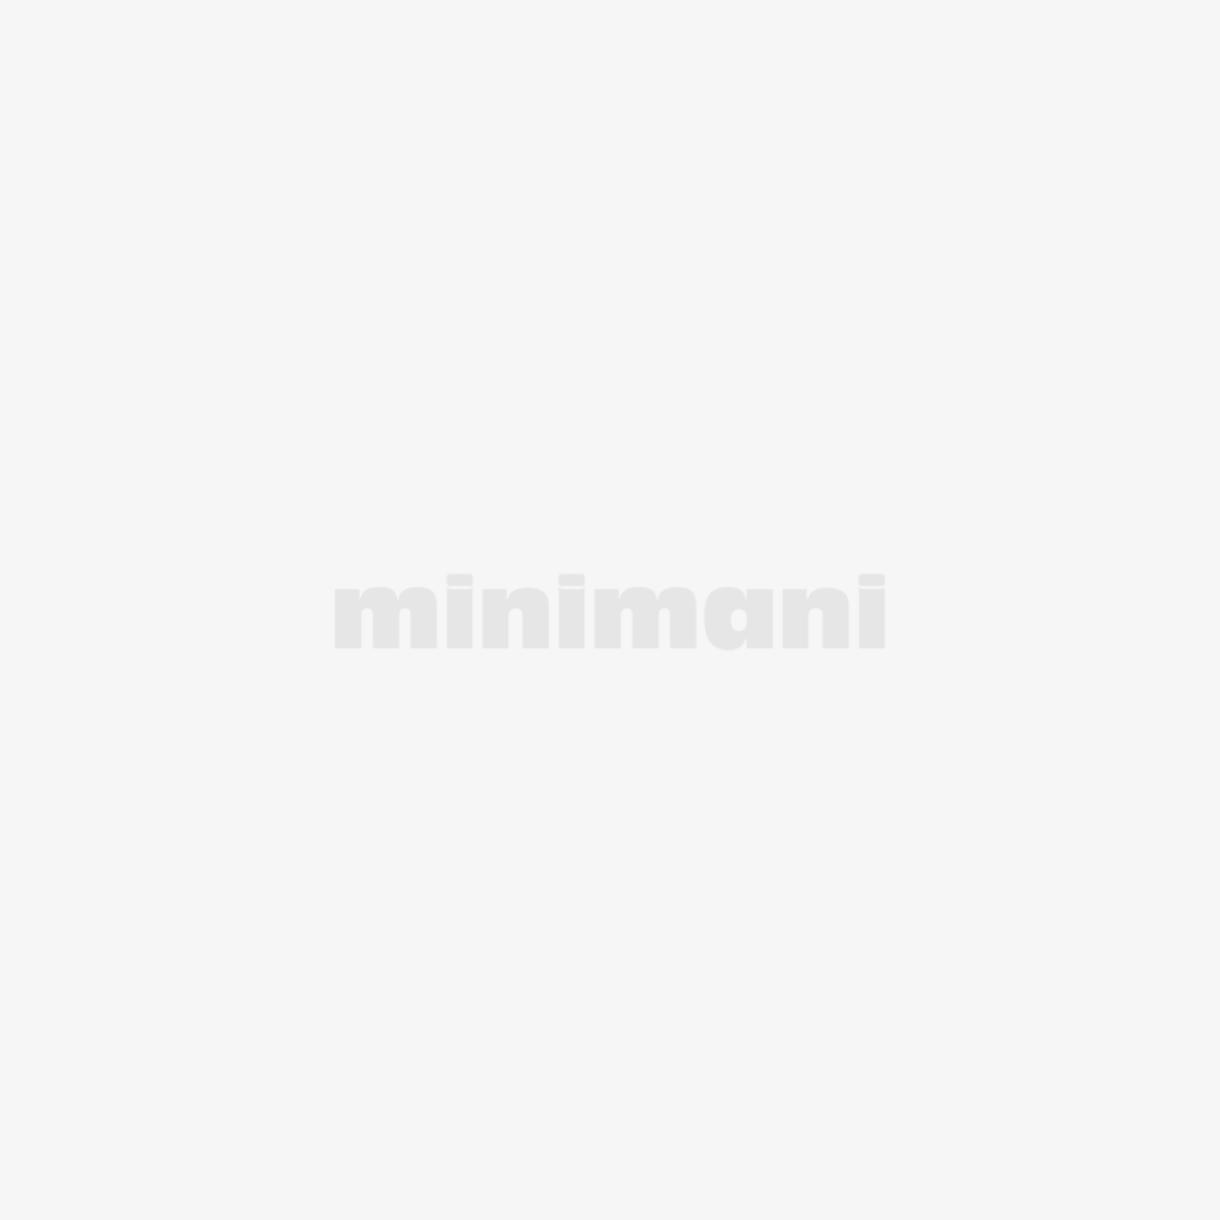 FINNWEAR MIESTEN NILKKASUKAT, FRESH VILLA 46-48 1210